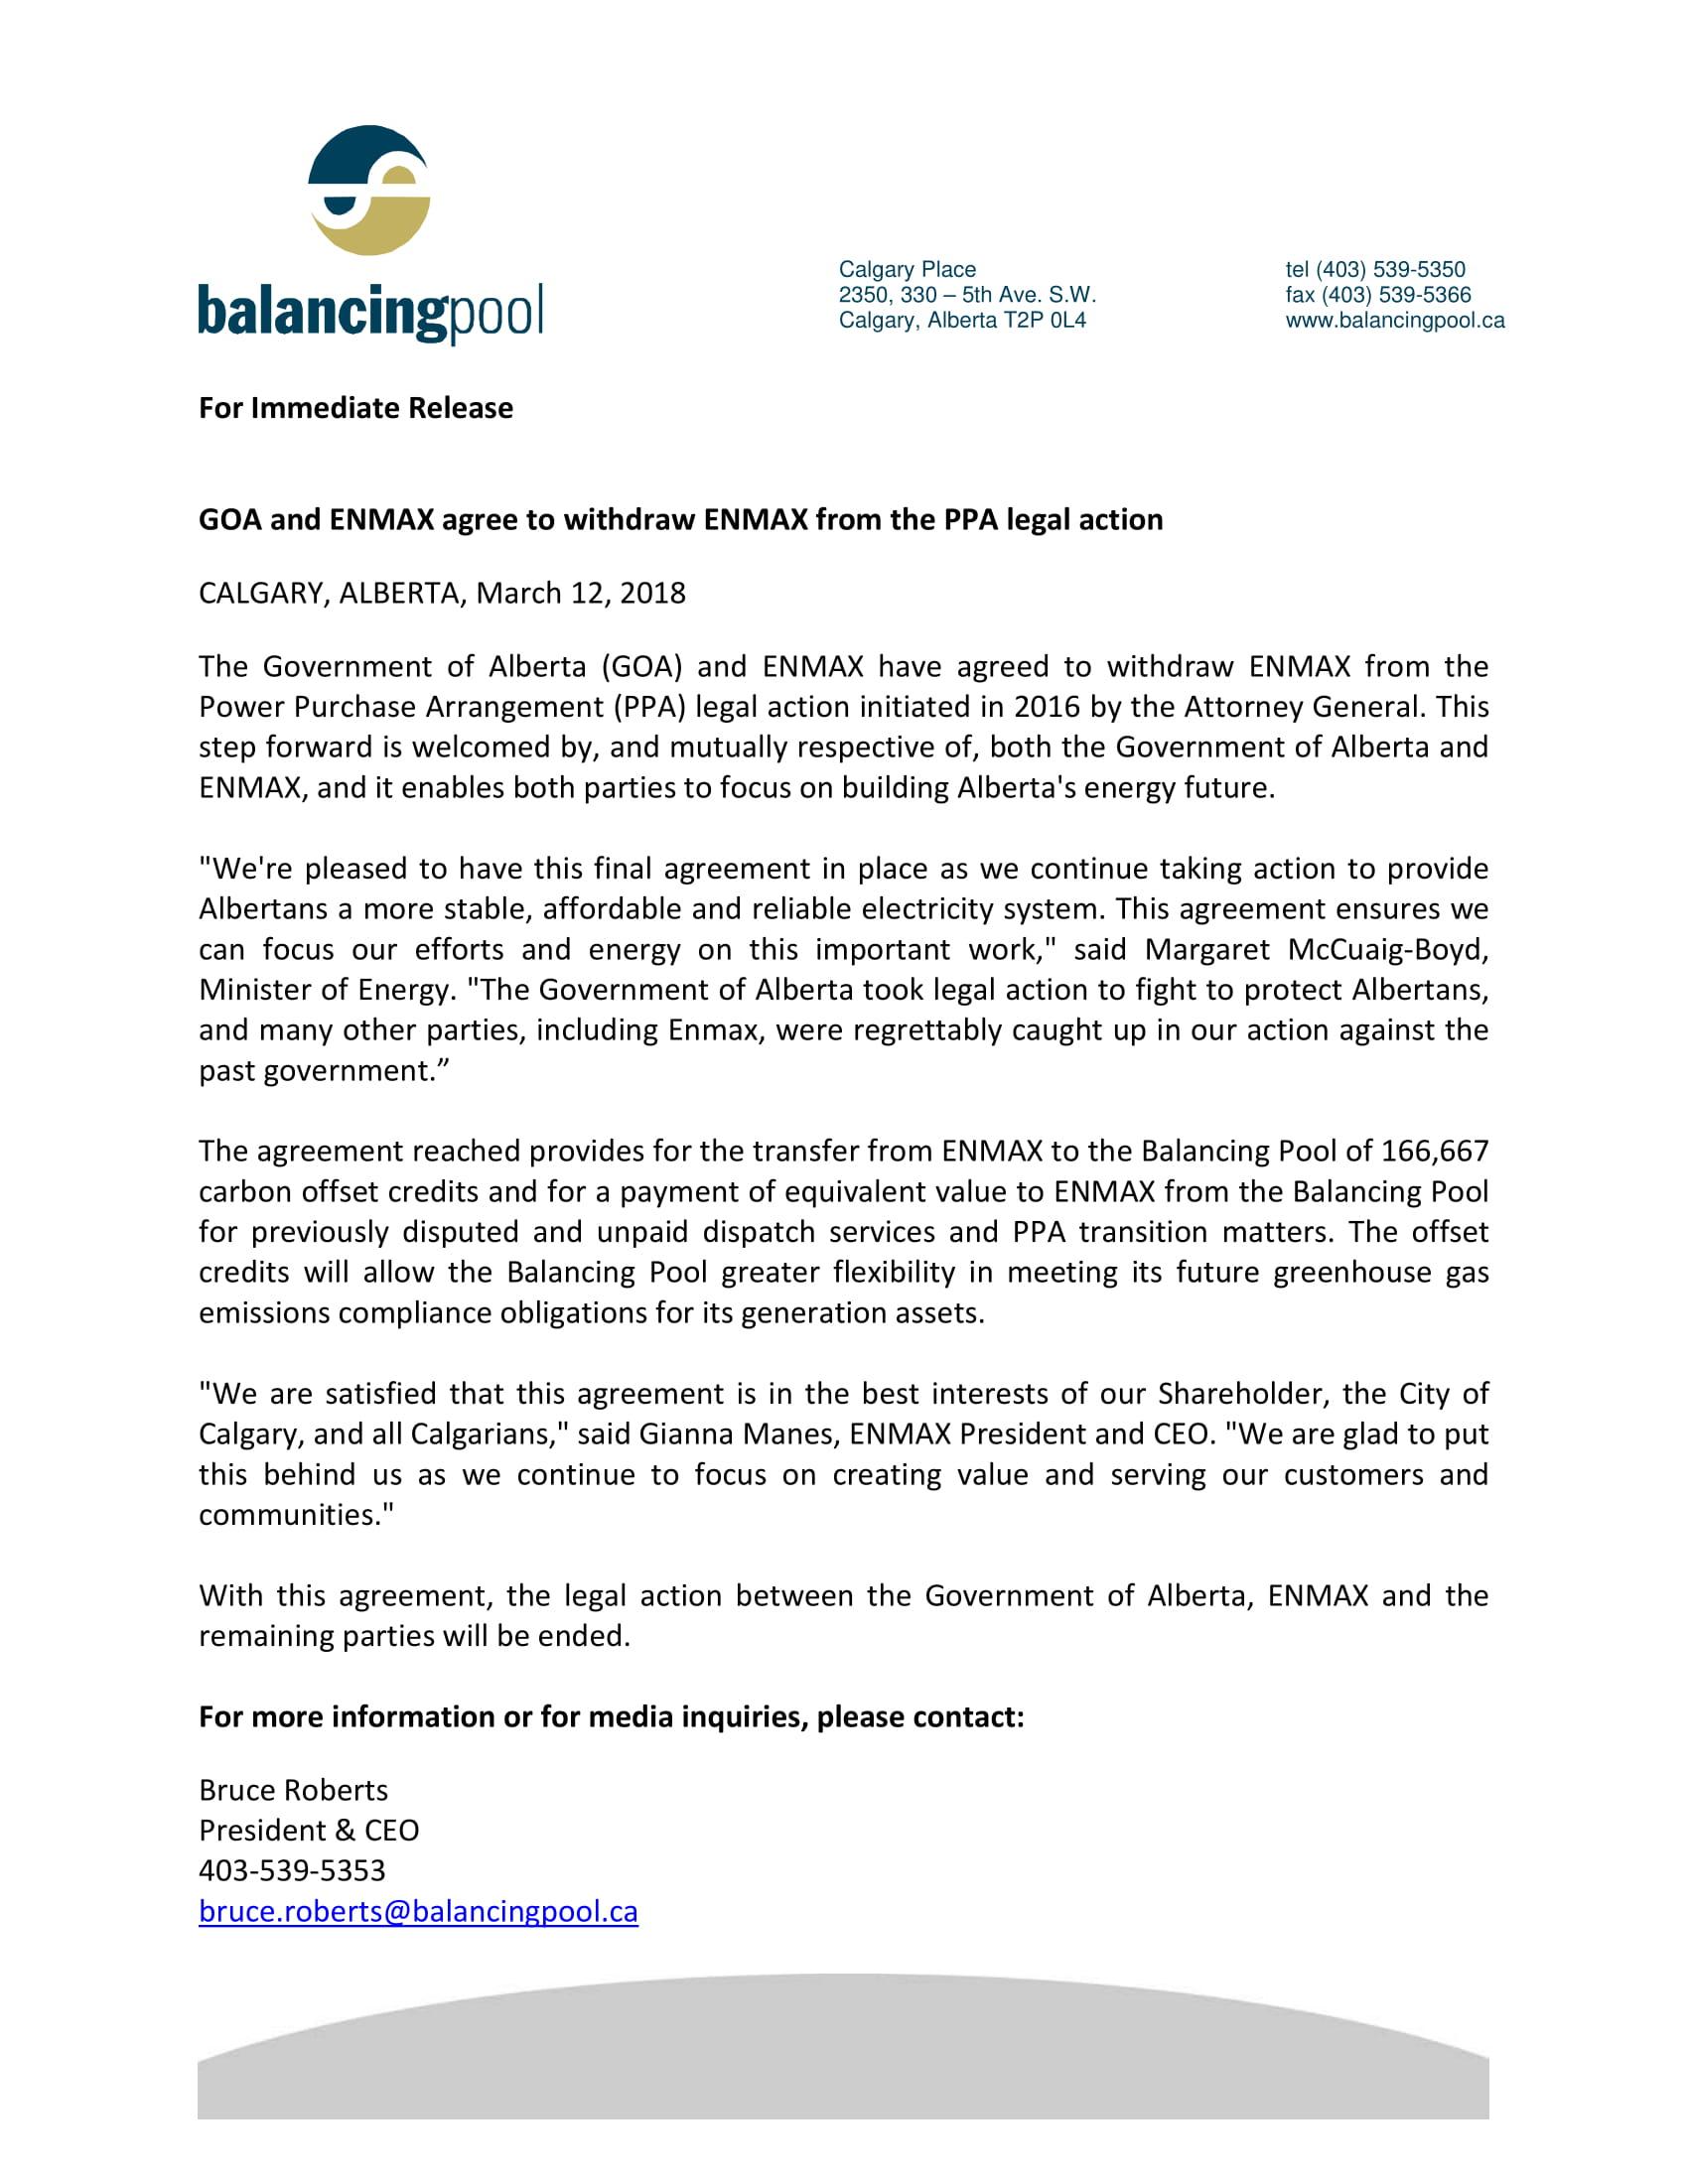 News Release 2018 ENMAX Settlement